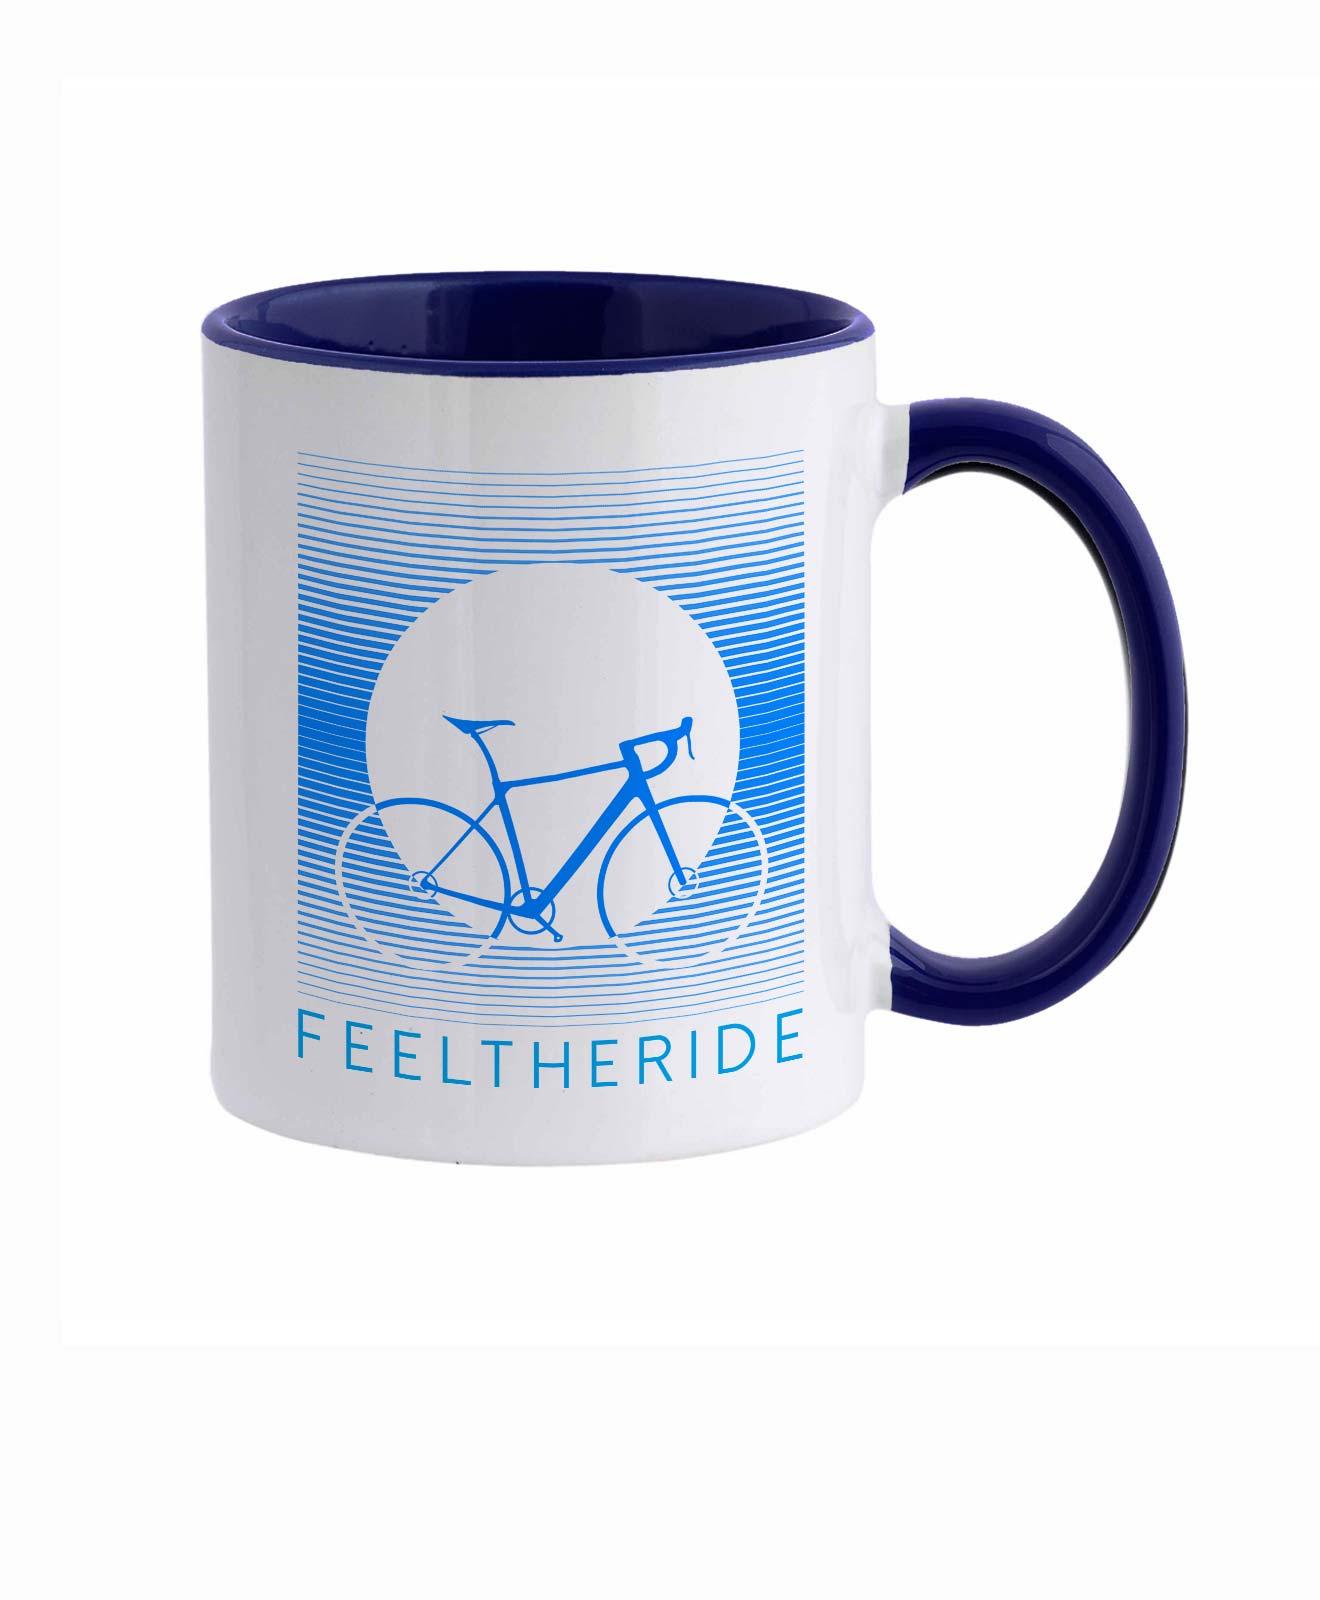 Feel The Ride With Your Bike Mug 2 Amazing Mtb Road Designs